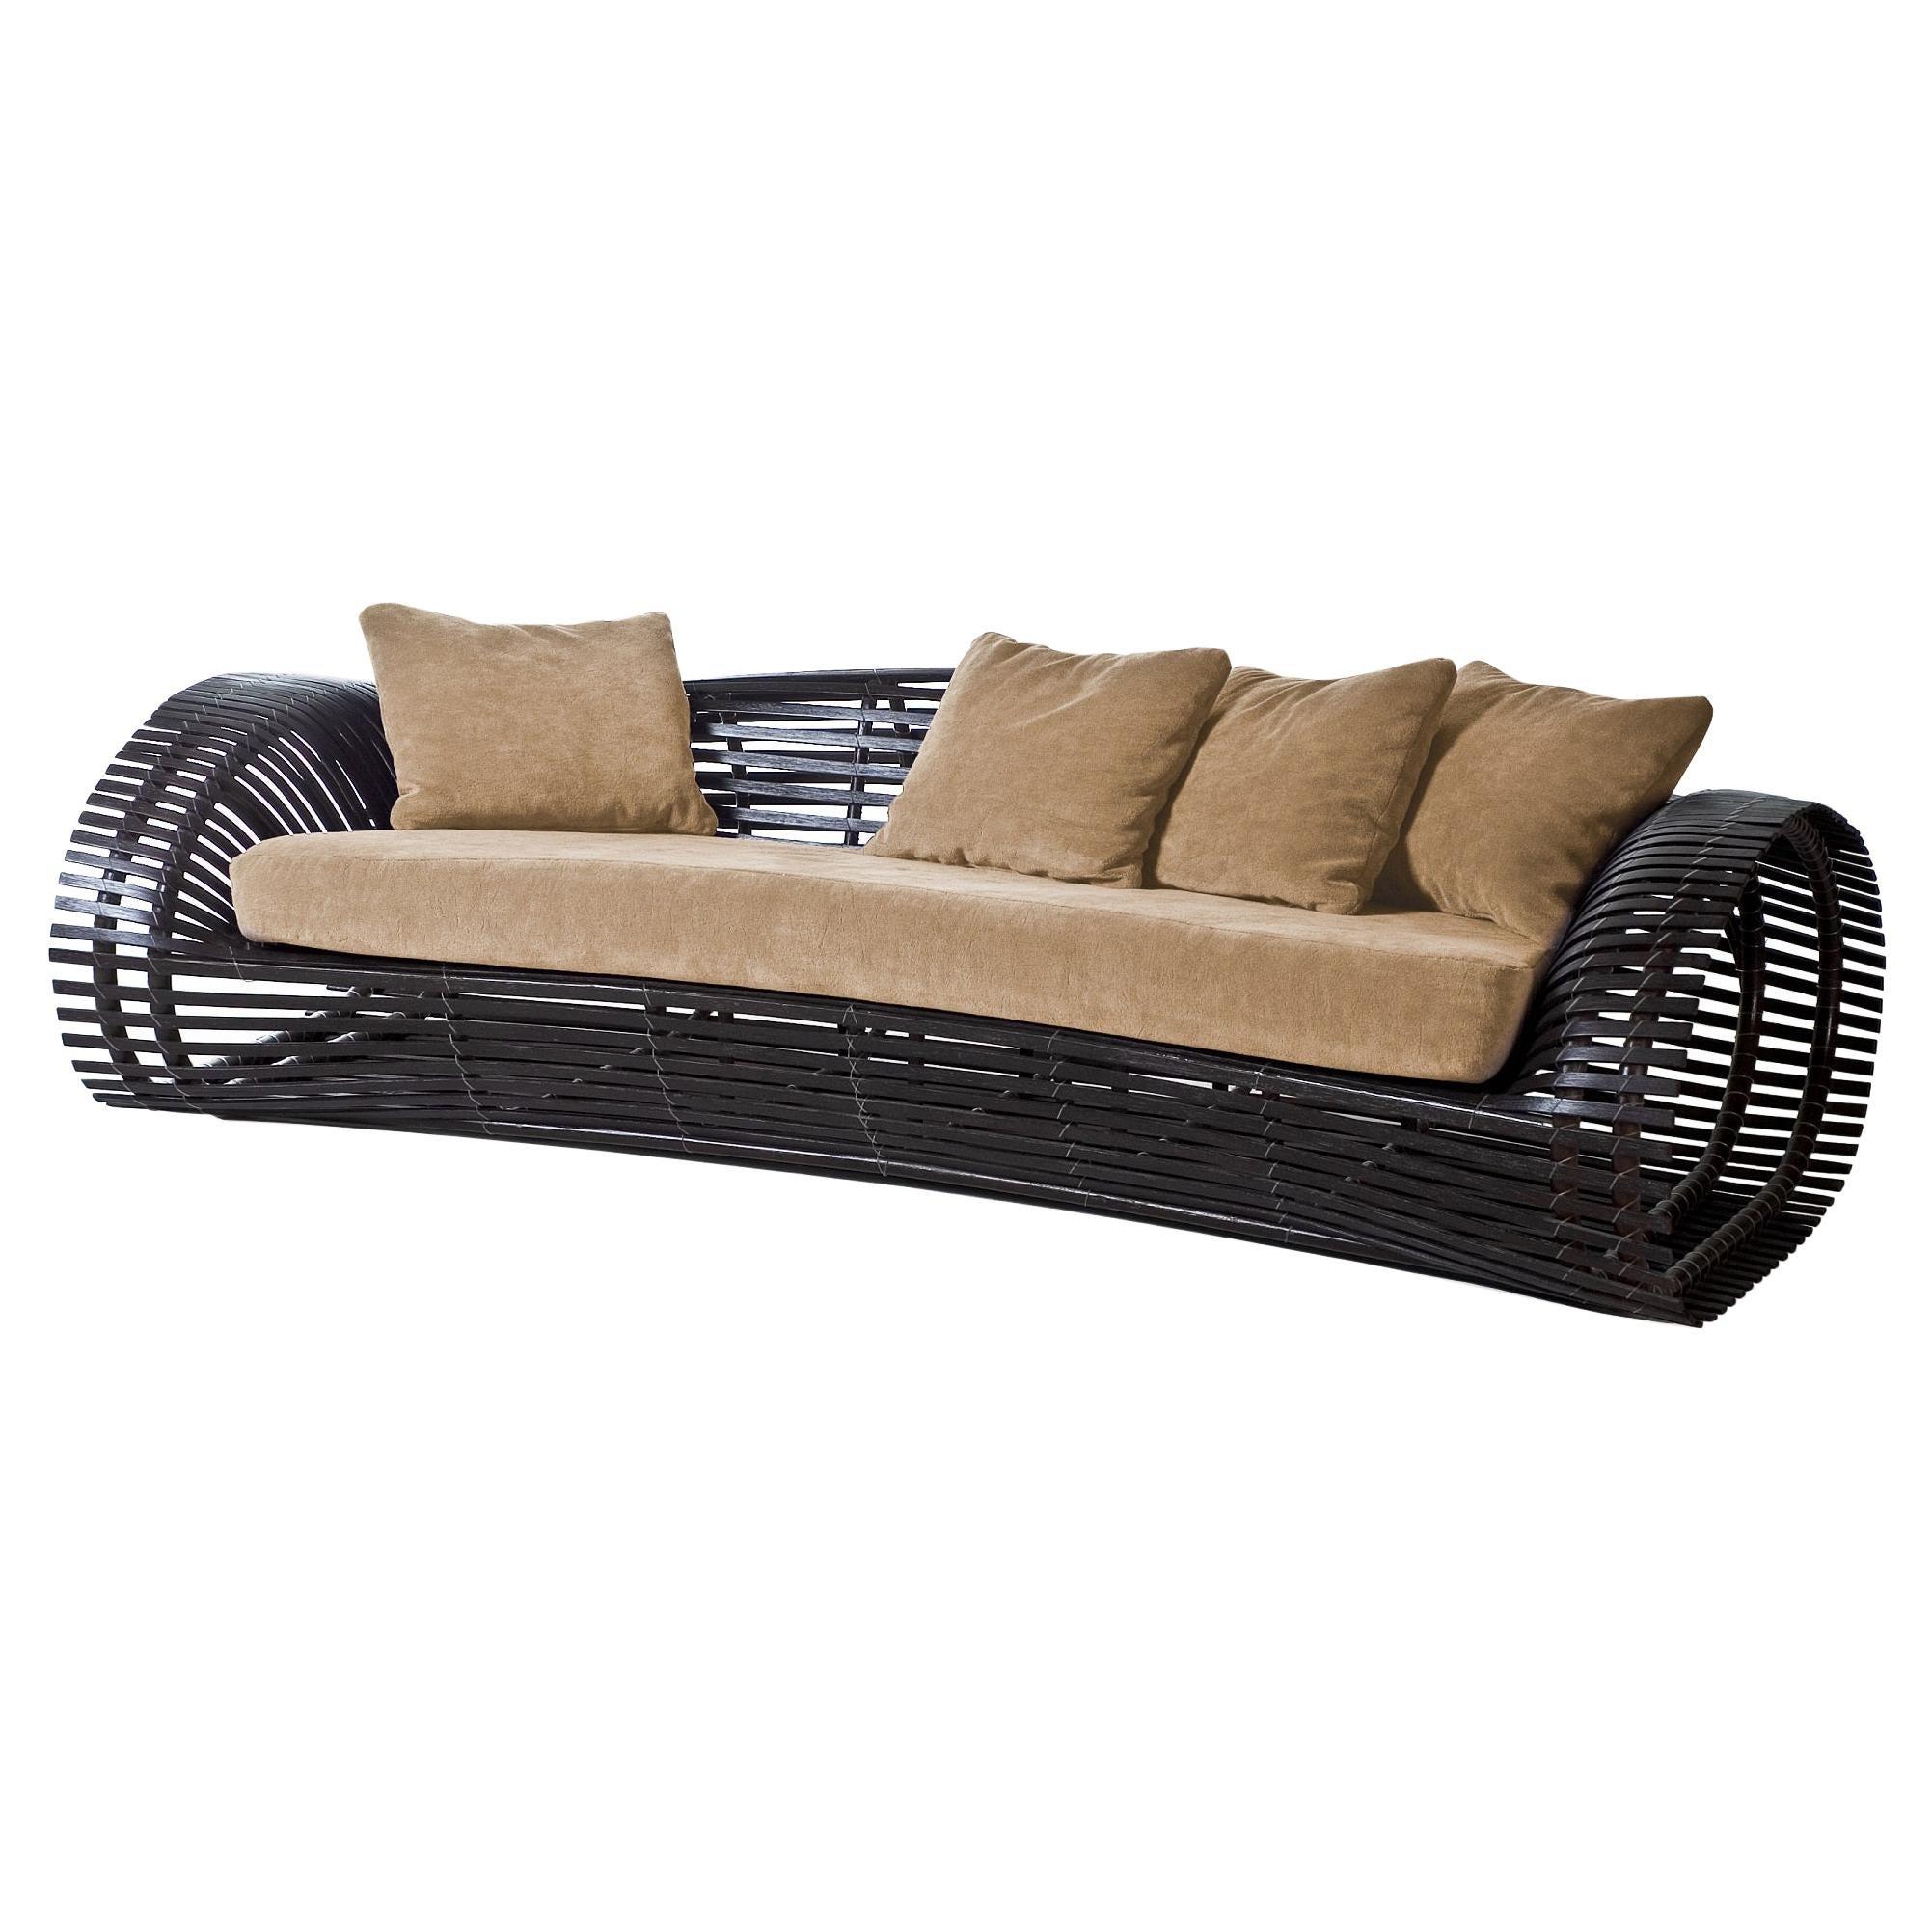 Indoor Lolah Sofa by Kenneth Cobonpue